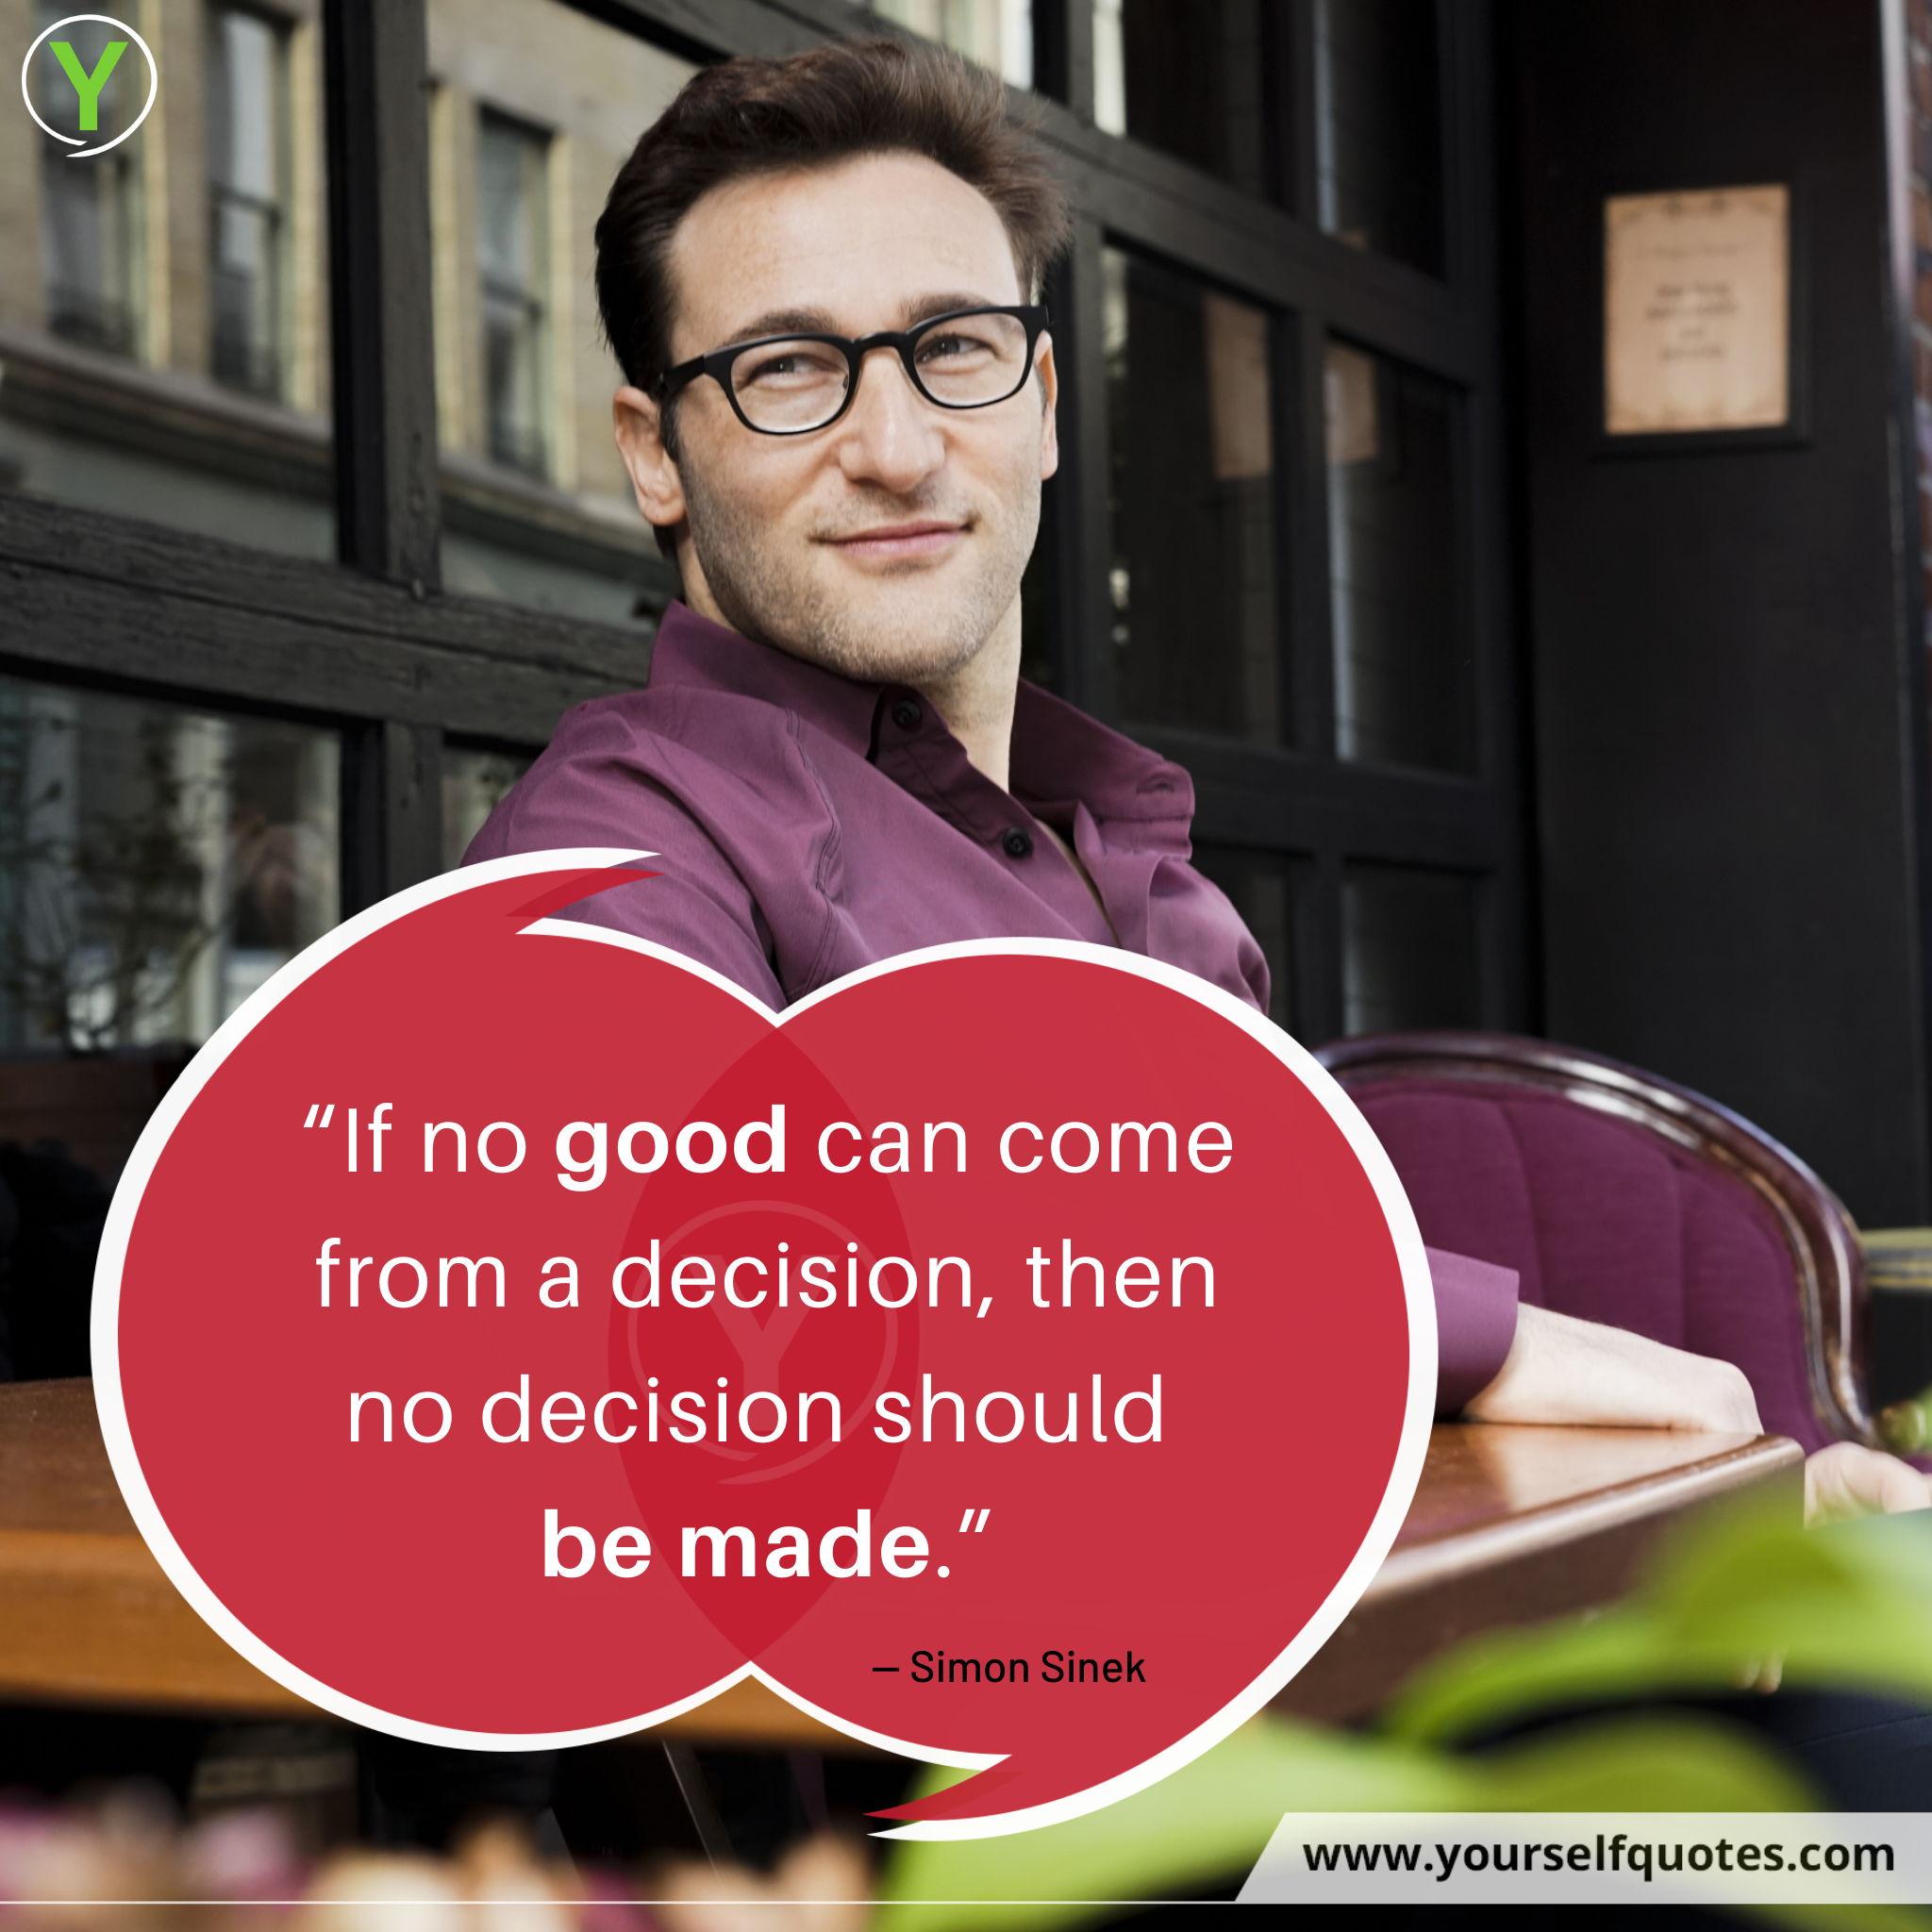 Good Quotes by Simon Sinek